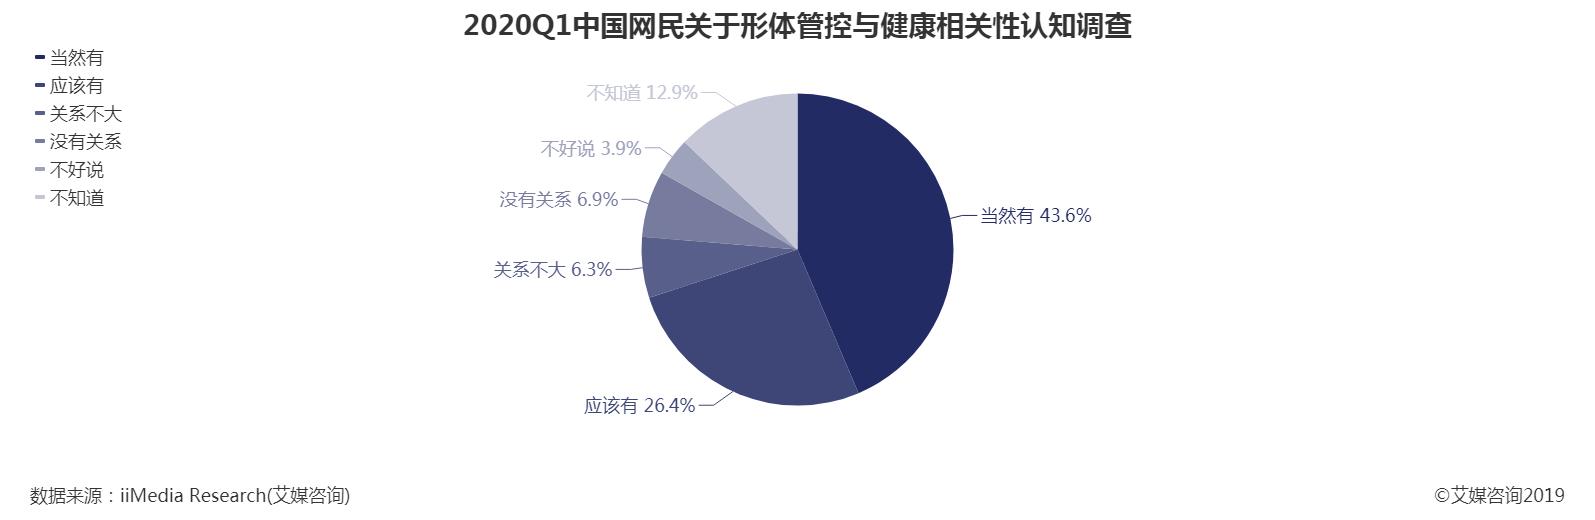 2020Q1中国网民关于形体管控与健康相关性认知调查